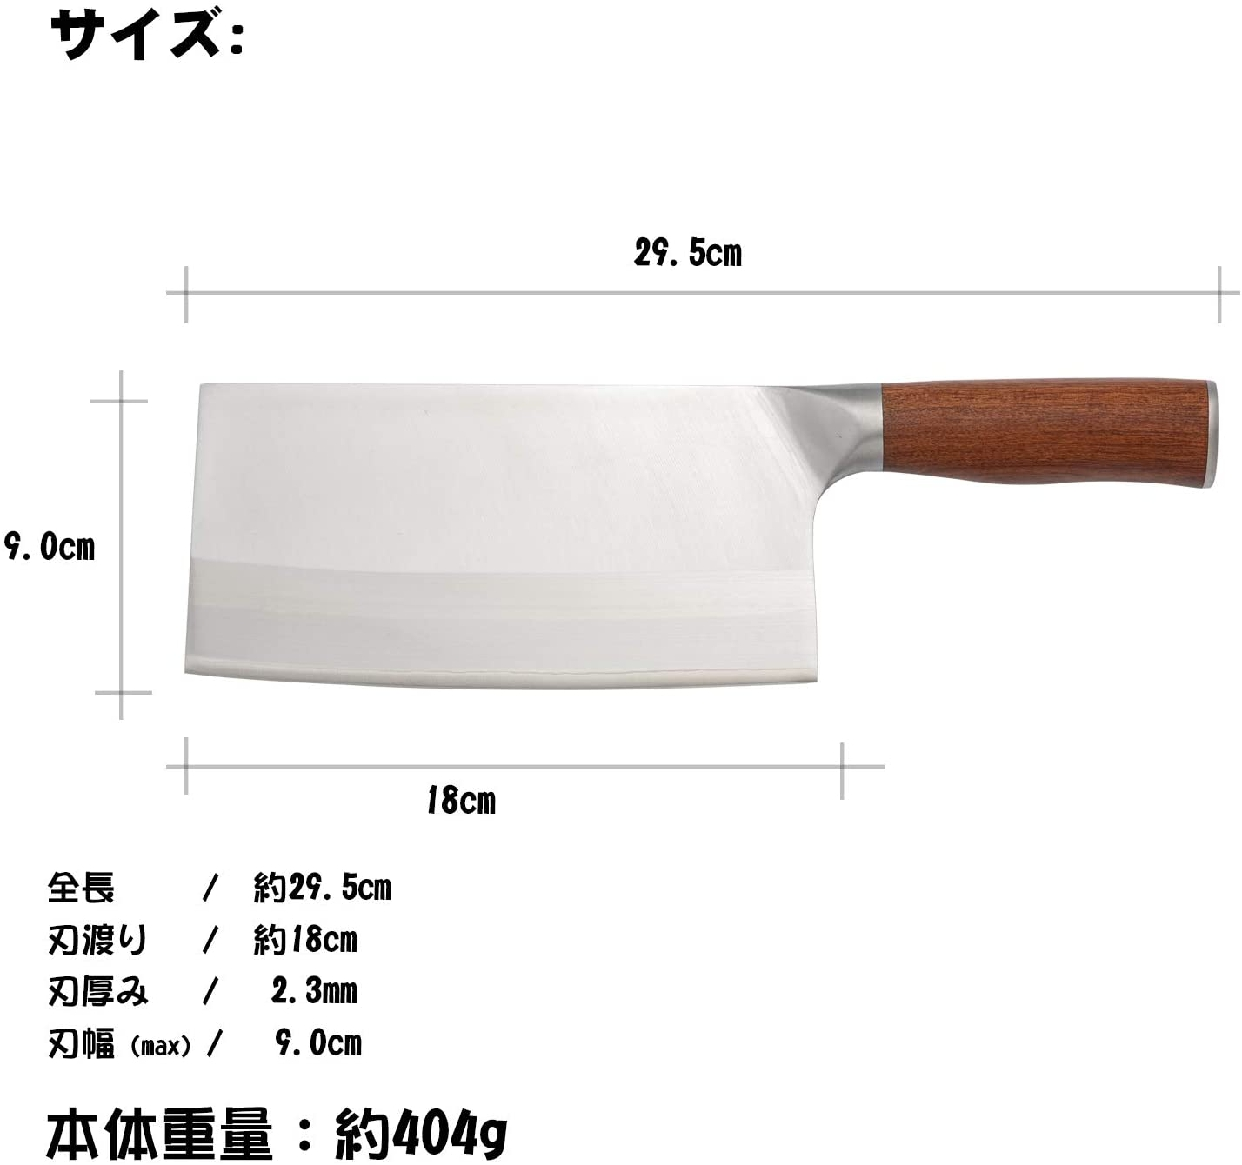 MUKAI(ムカイ) 中華包丁 29.5cmの商品画像8